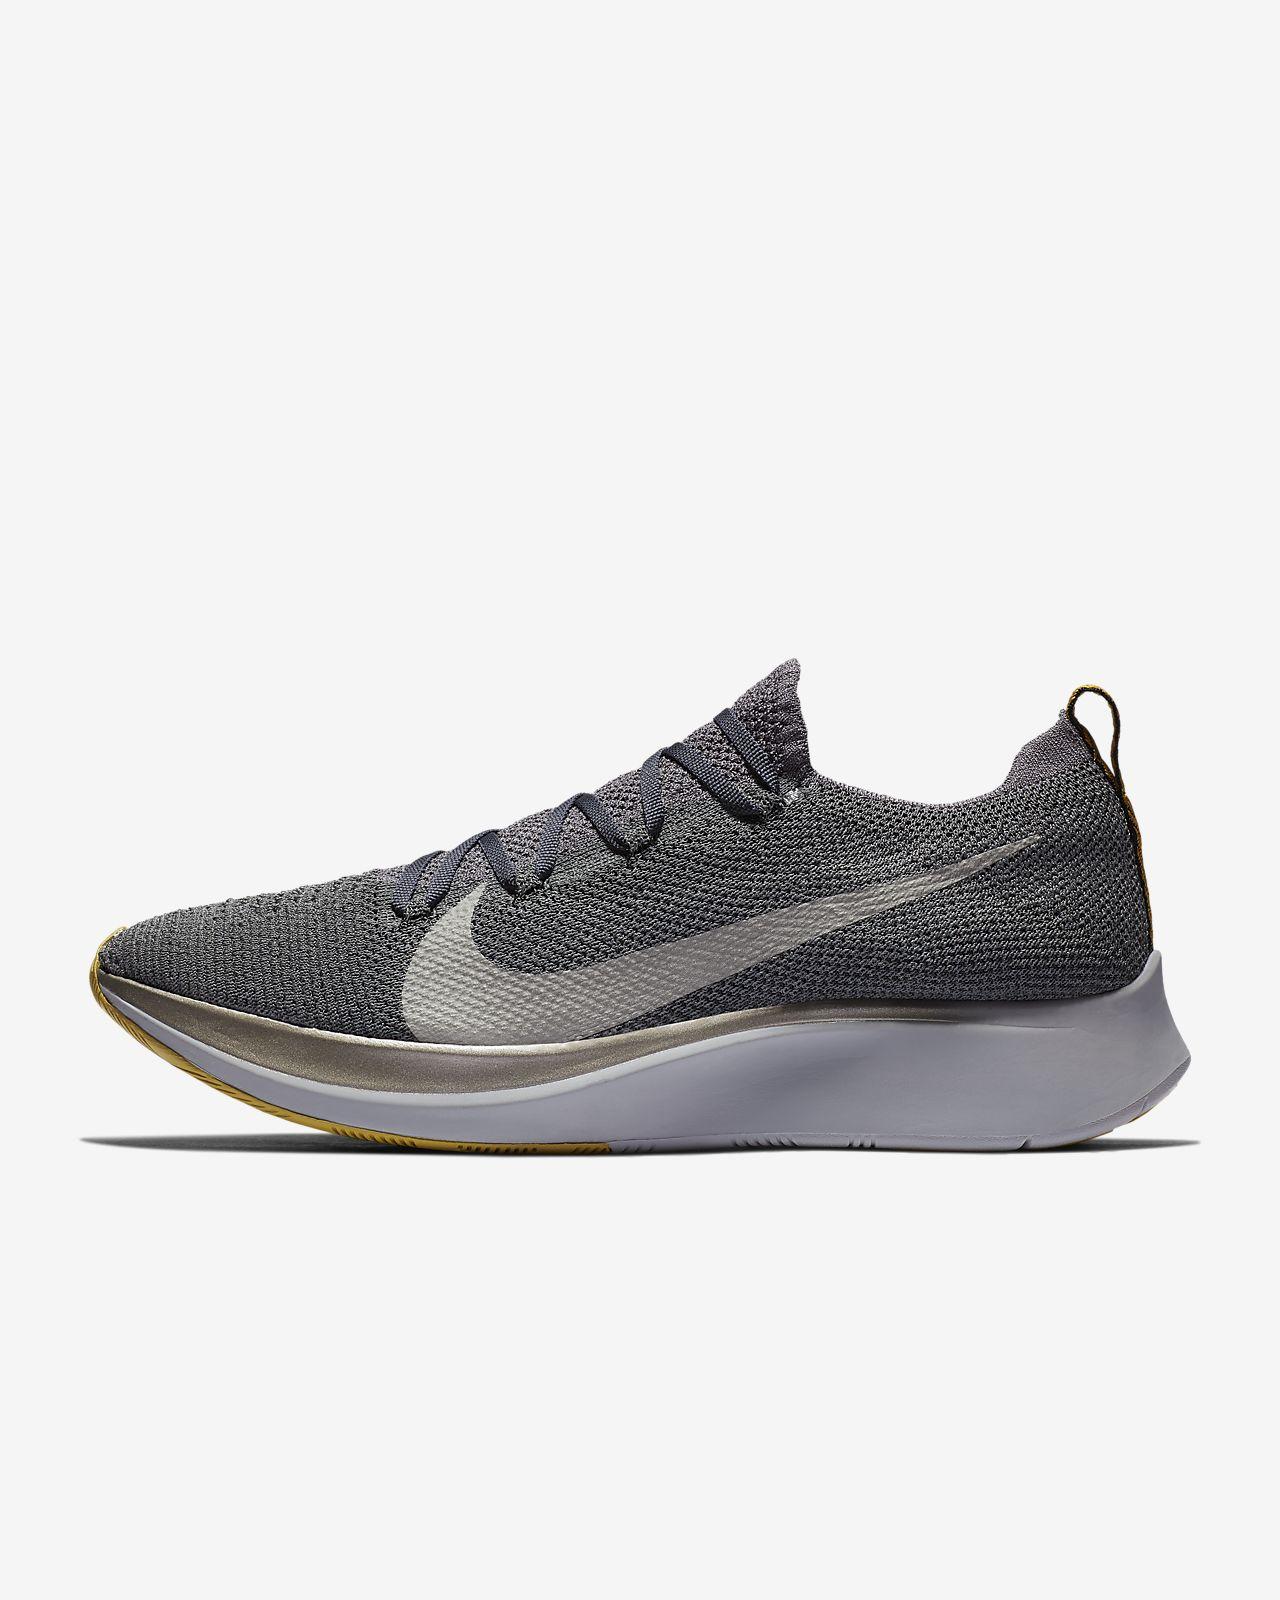 905599b1926 Nike Zoom Fly Flyknit Zapatillas de running - Hombre. Nike.com ES